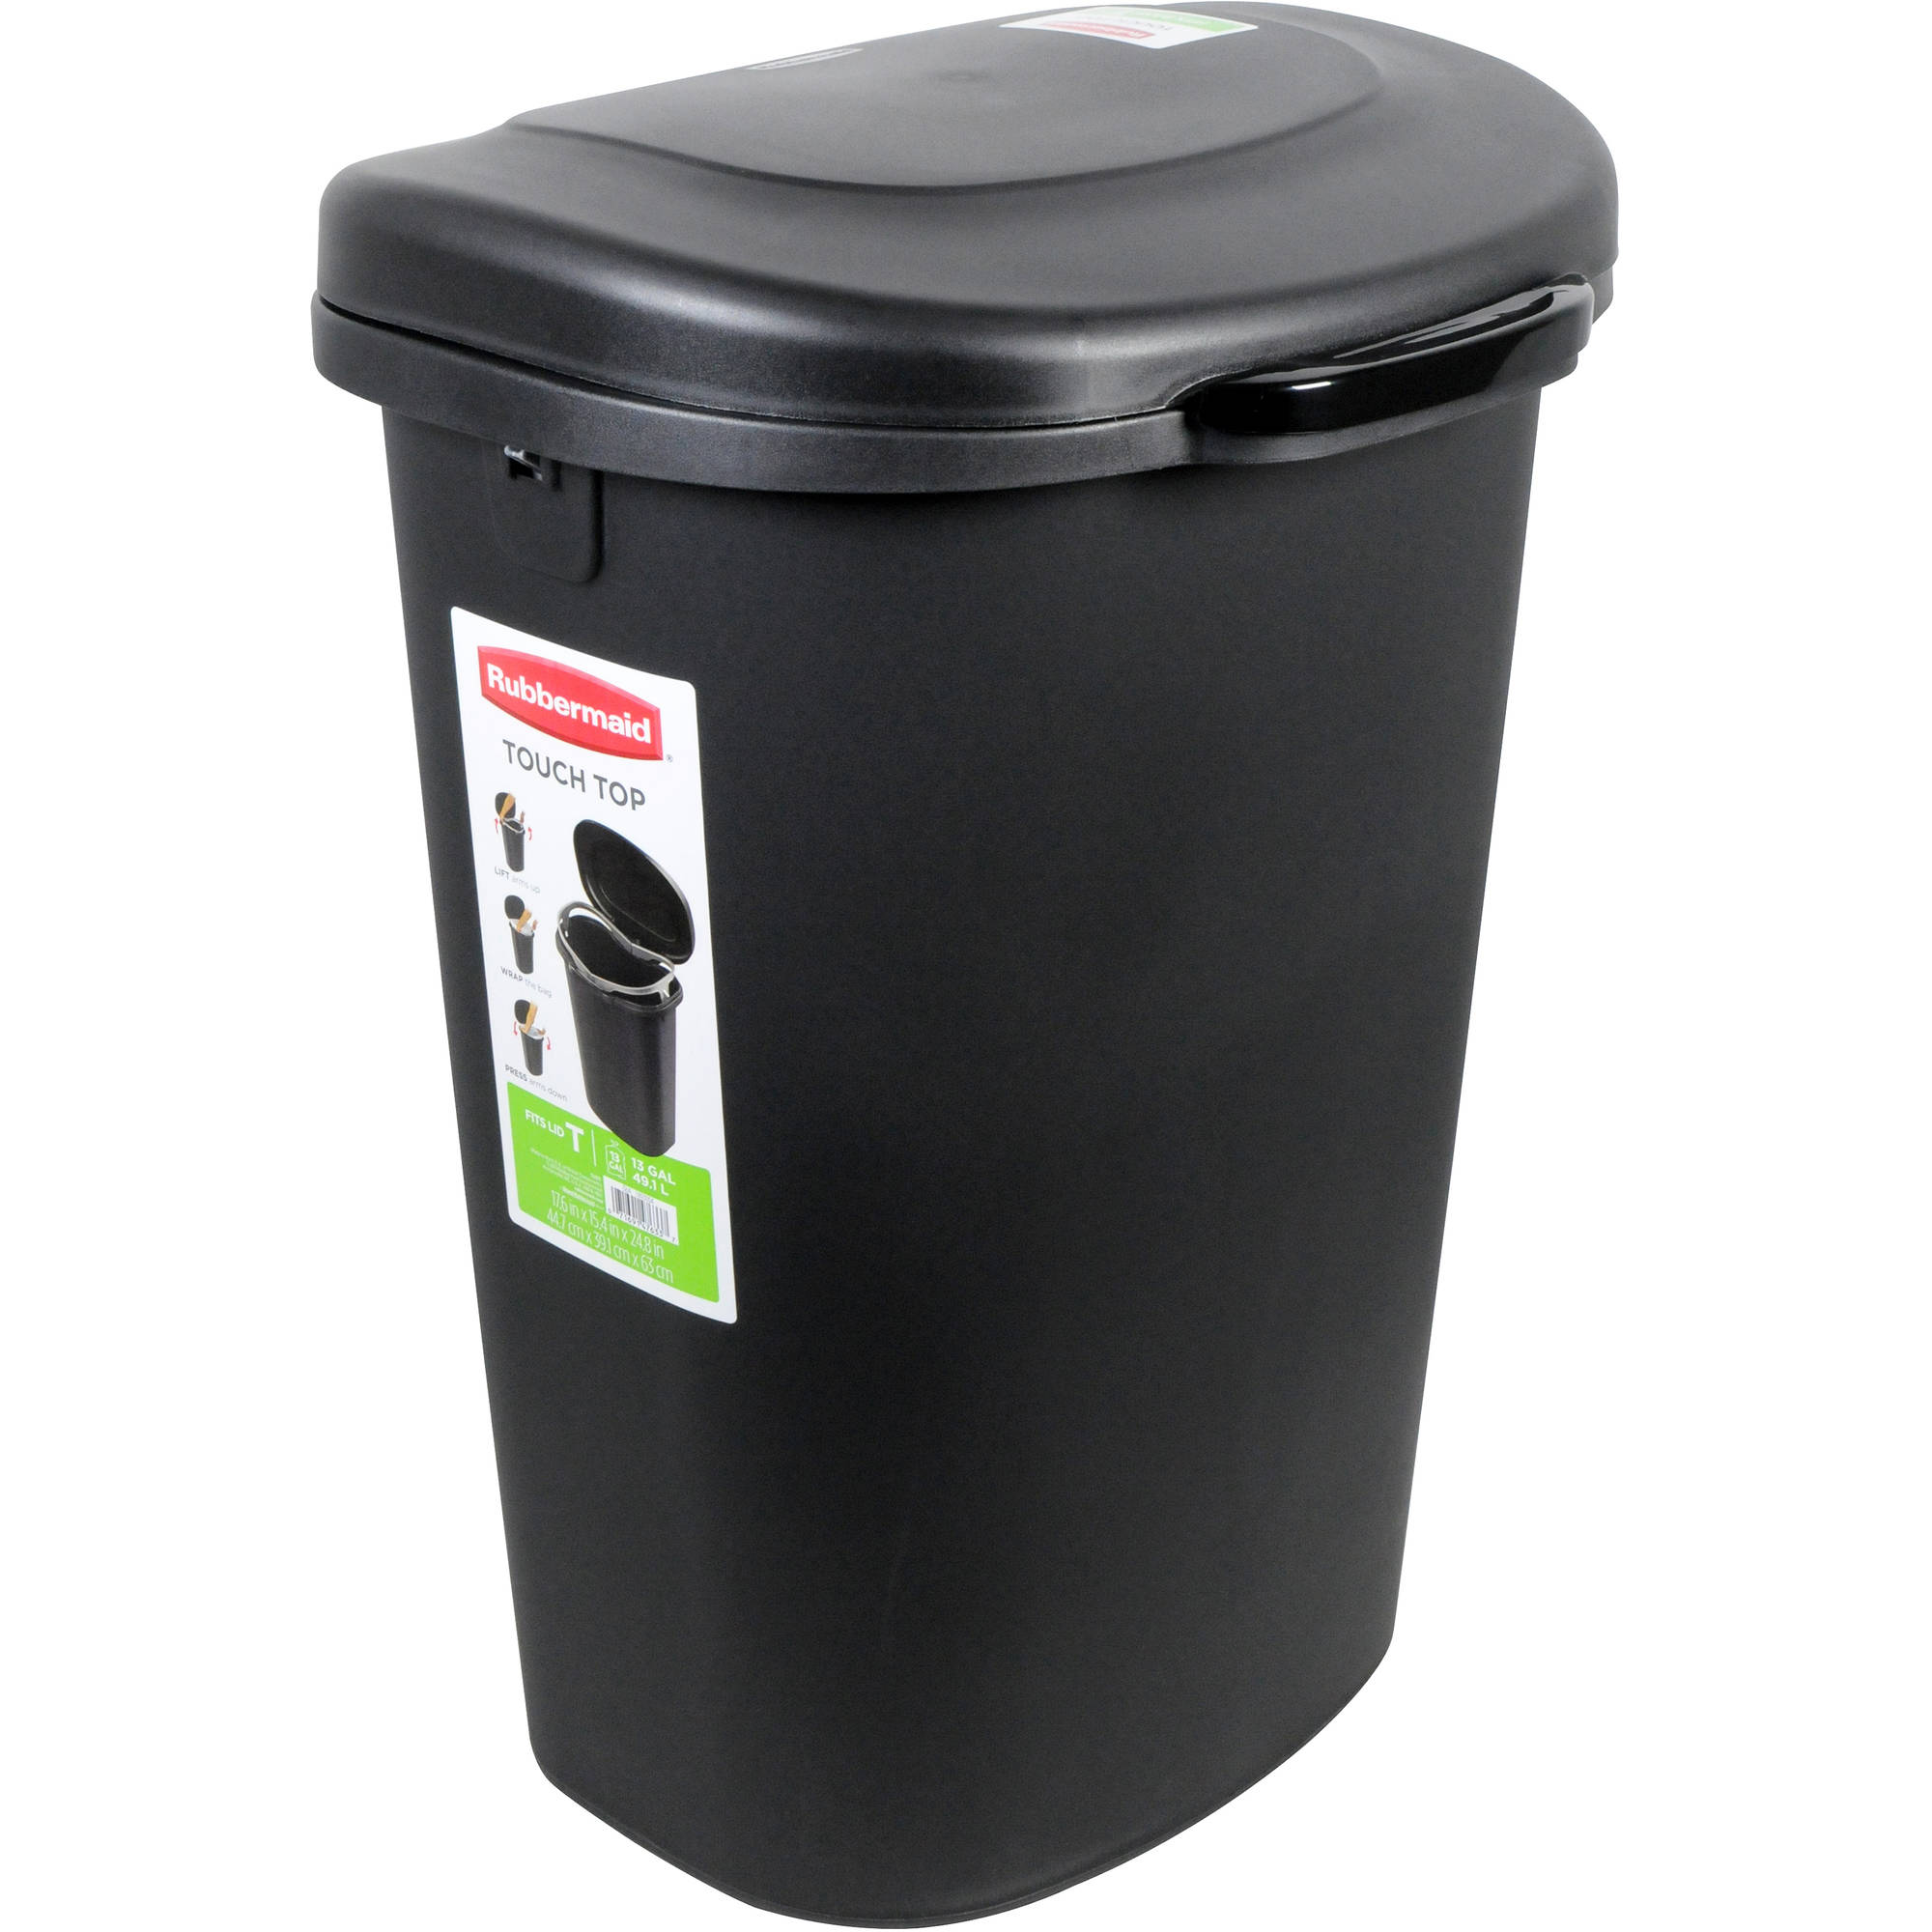 Rubbermaid 13-Gallon Touch Top Waste Bin, Black